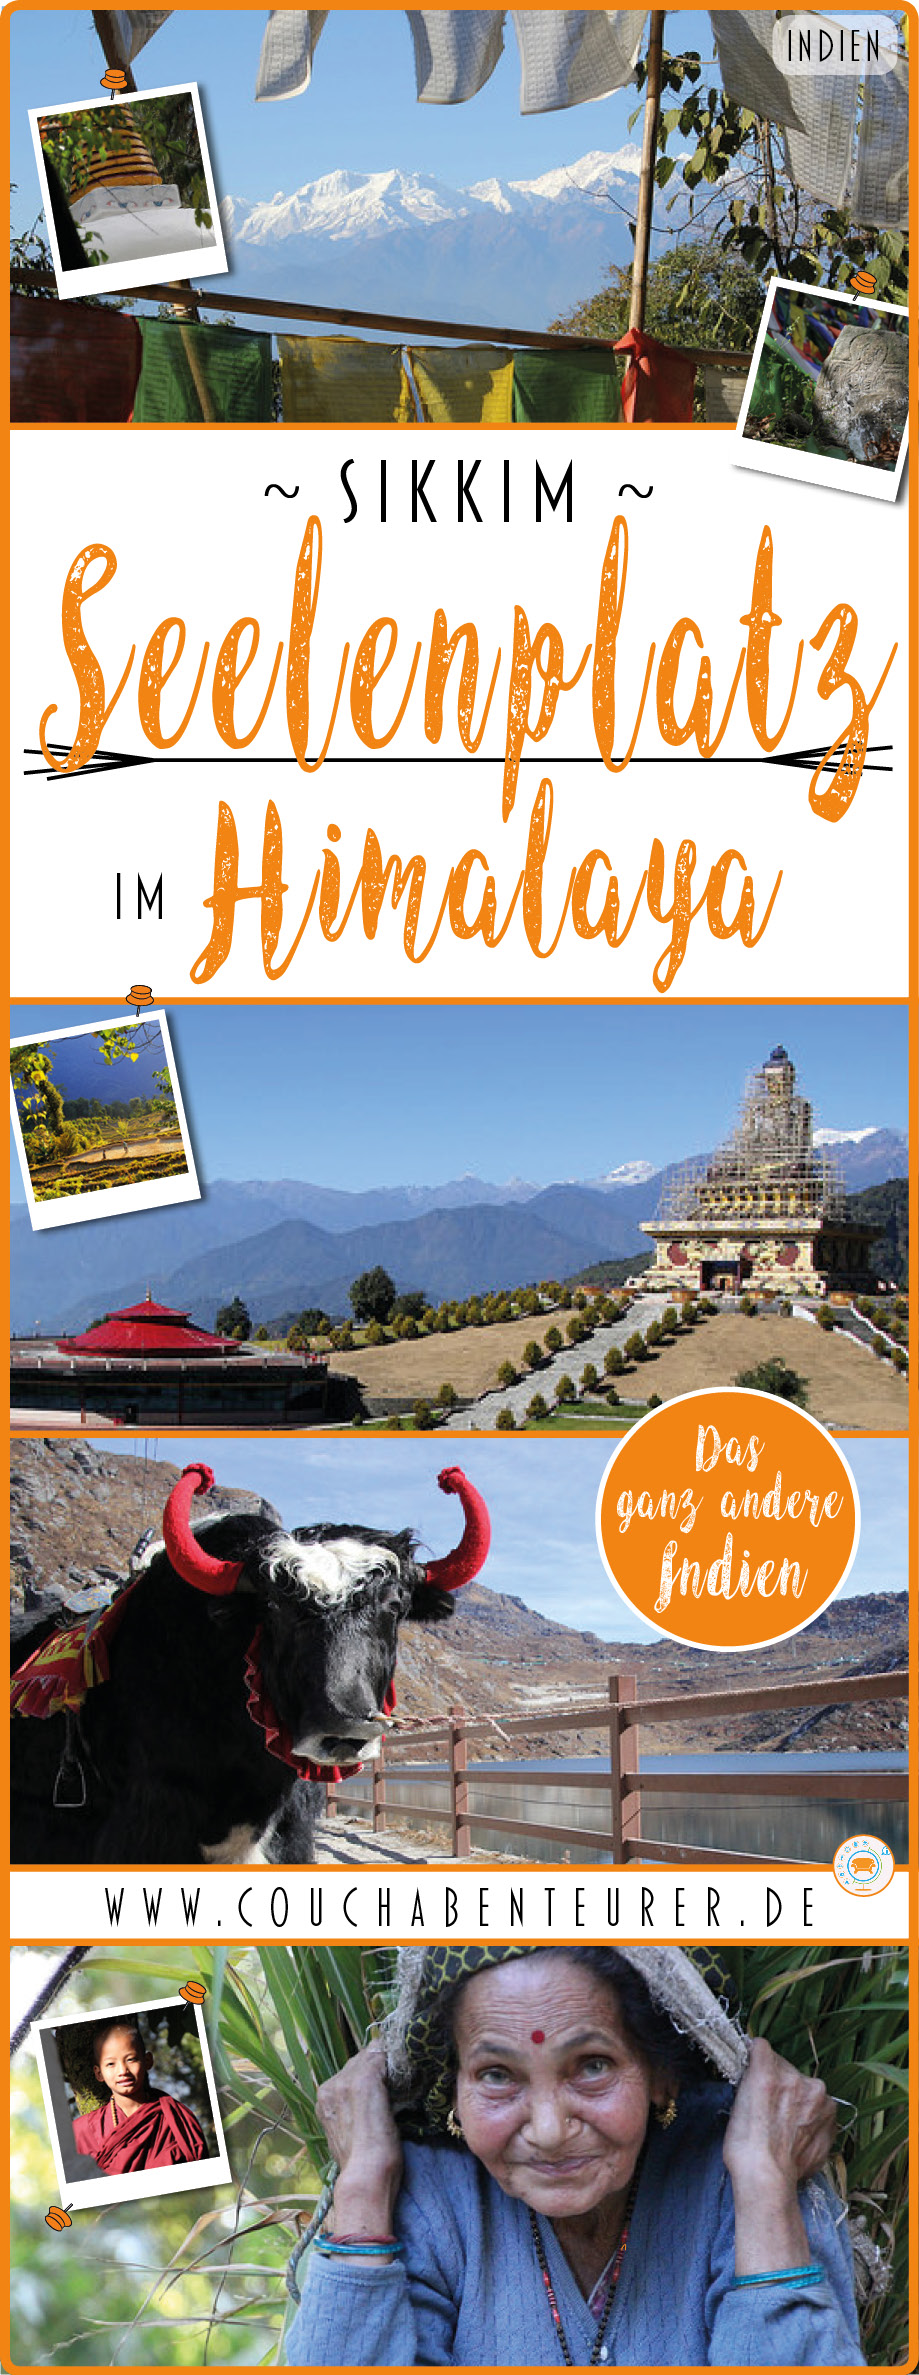 Sikkim-Seelenplatz-im-Himalaya